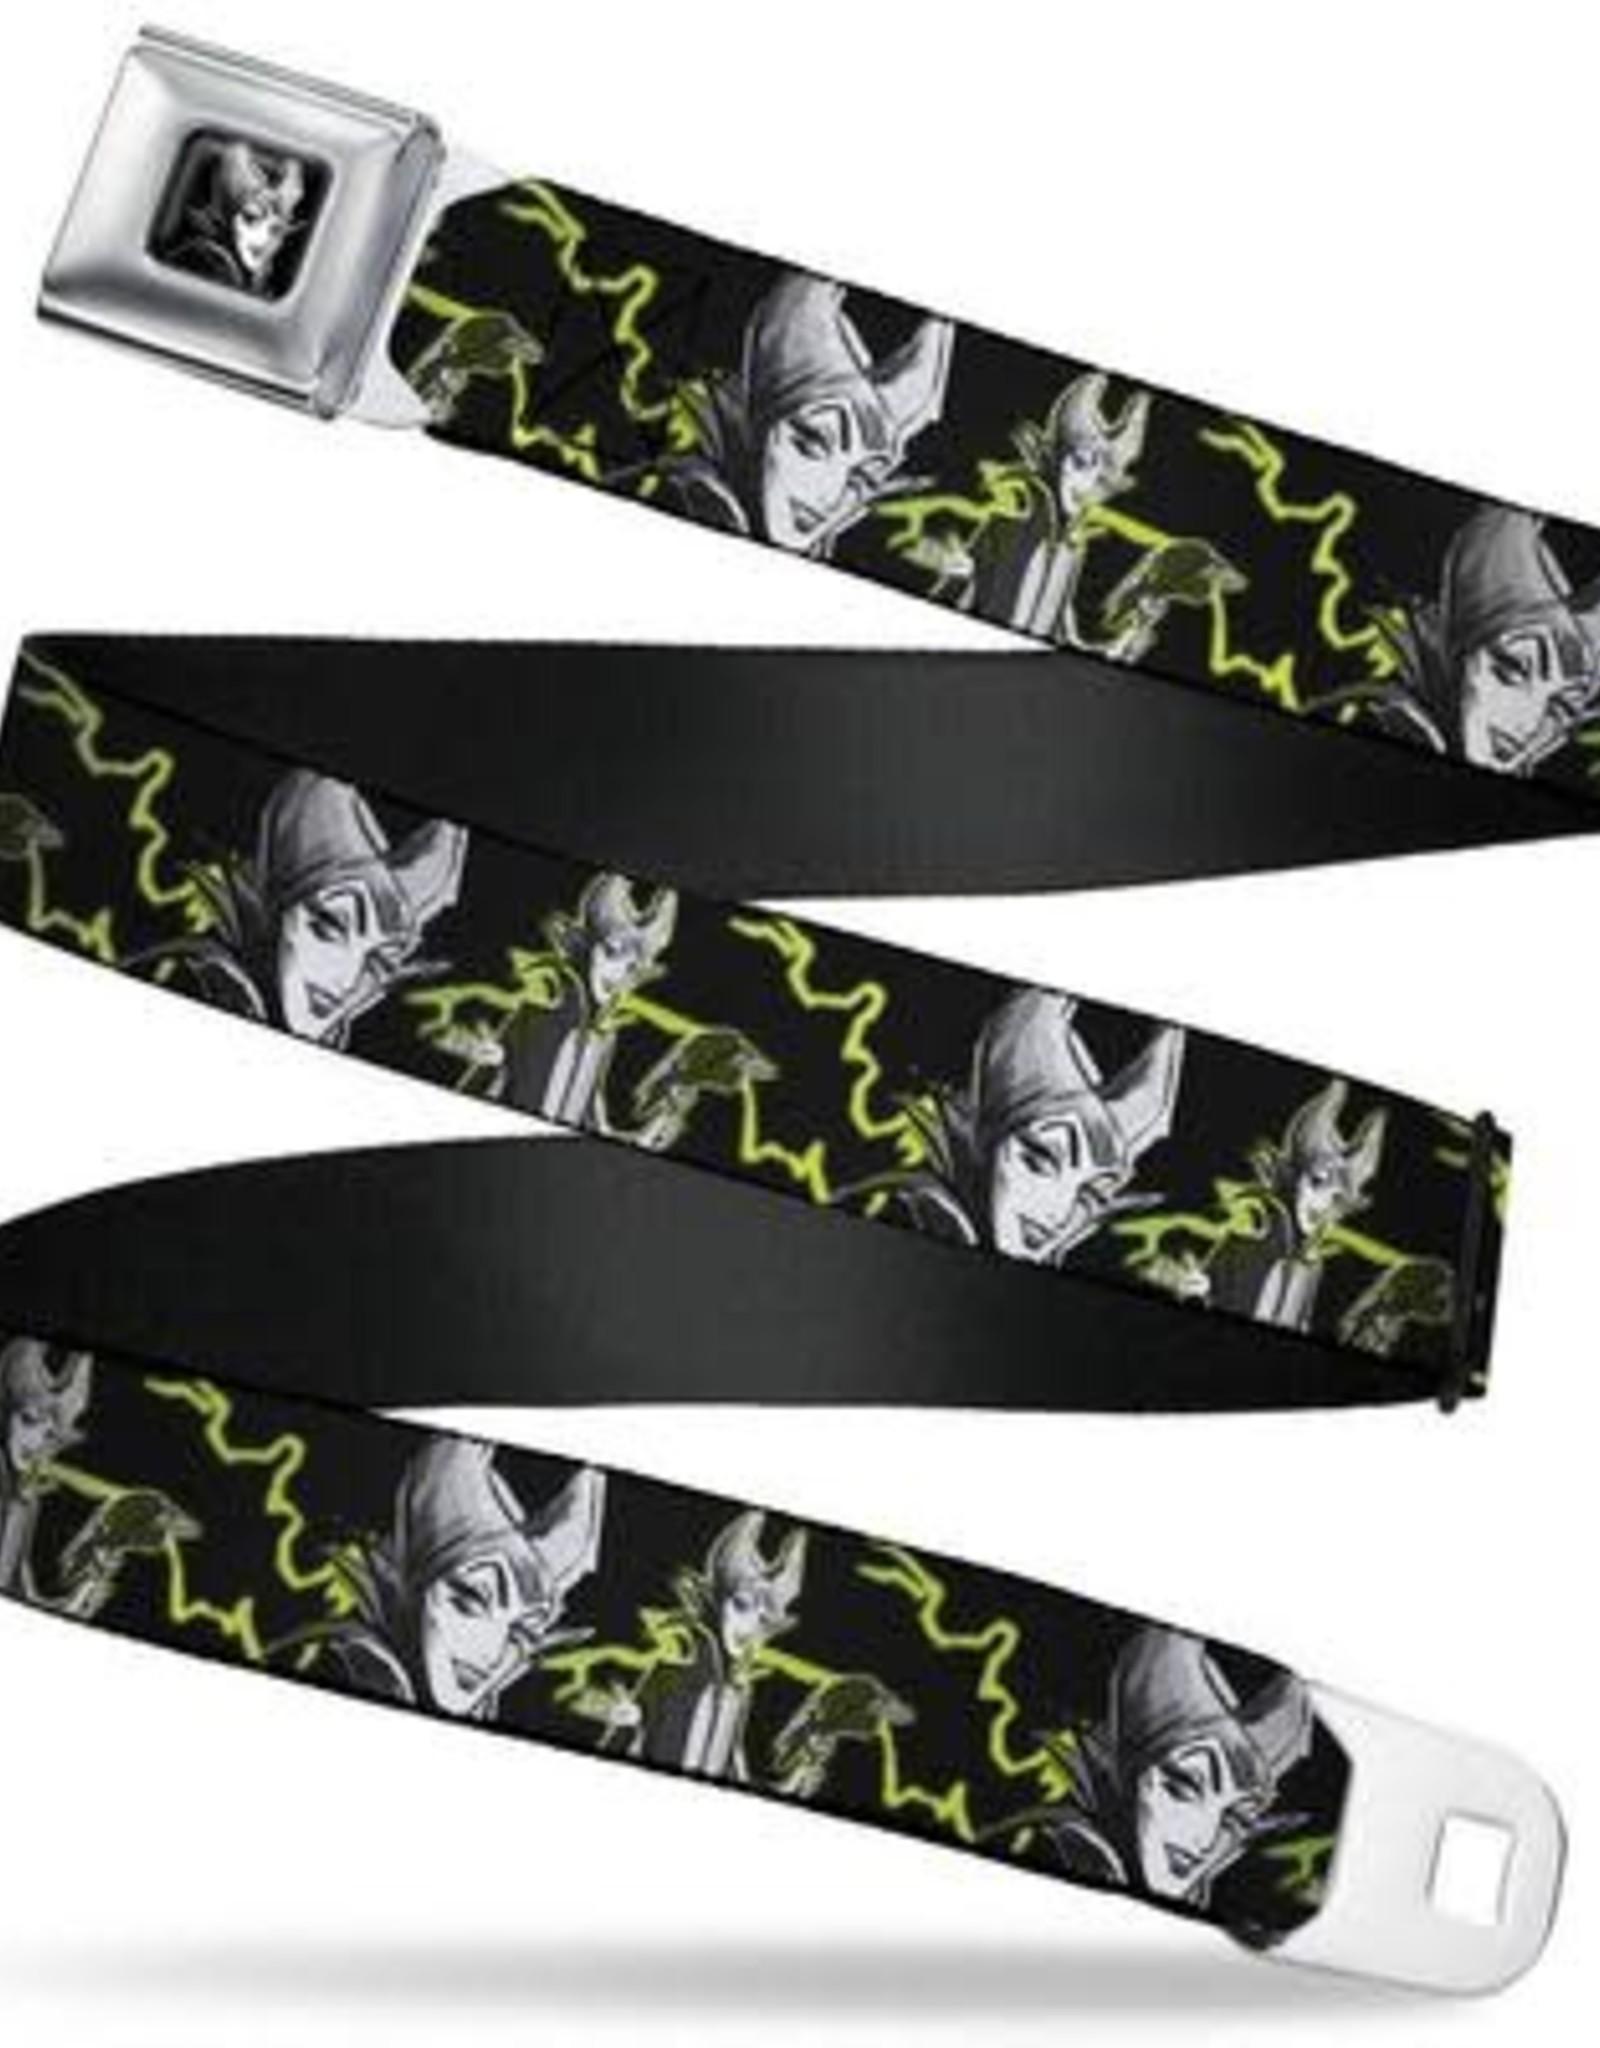 Buckle Down Belts Maleficent Seatbelt Belt with Lightning Bolts